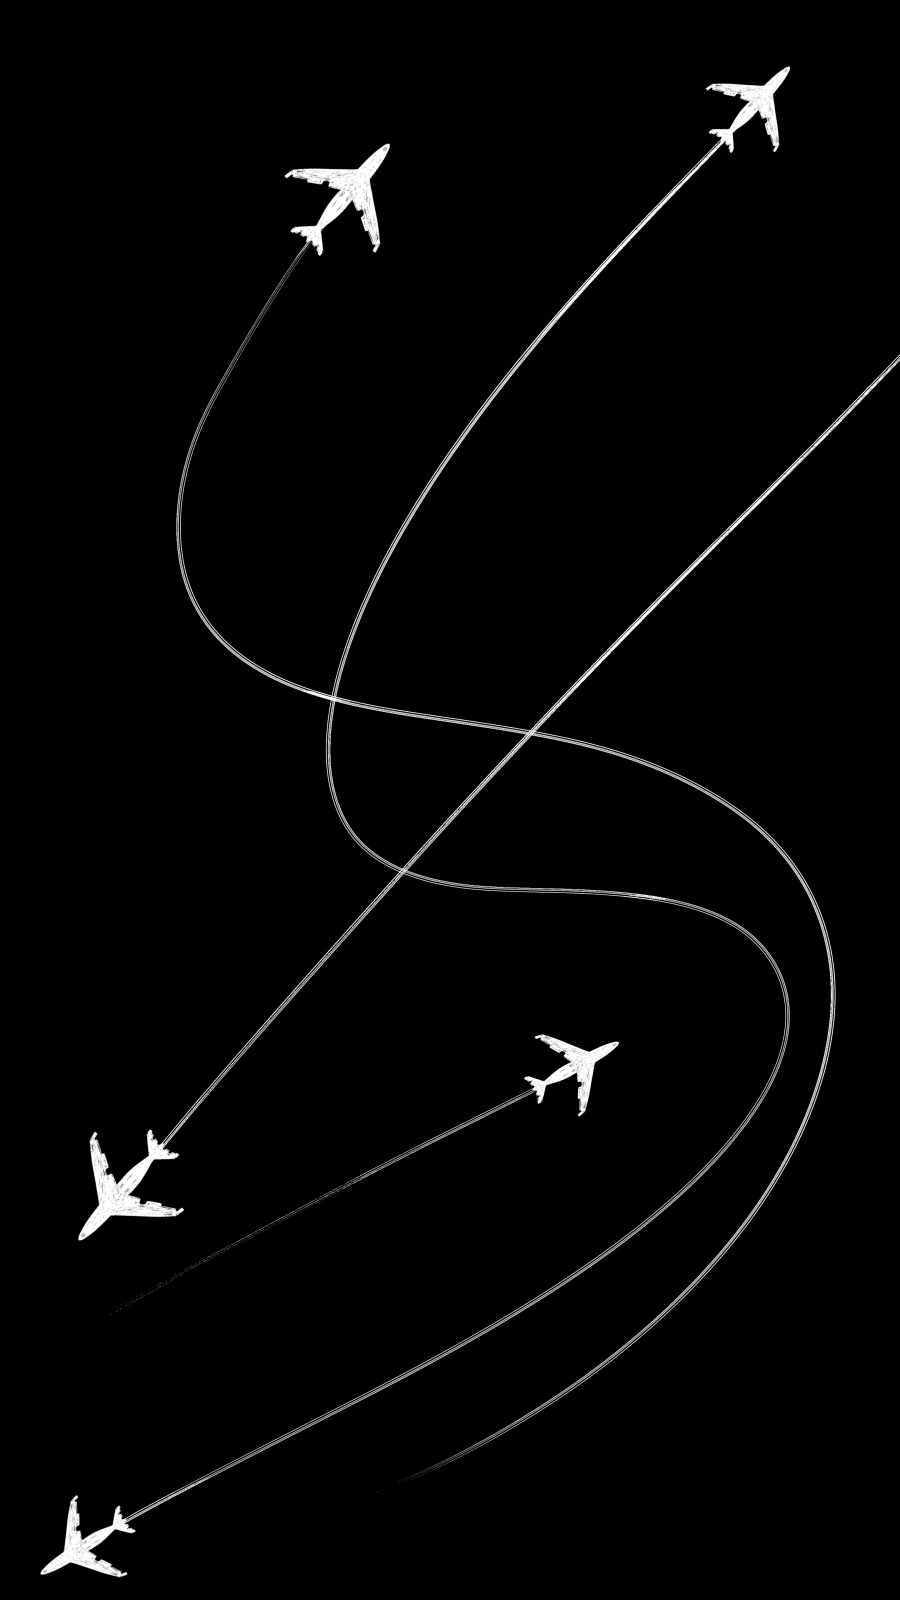 Planes Minimal iPhone Wallpaper